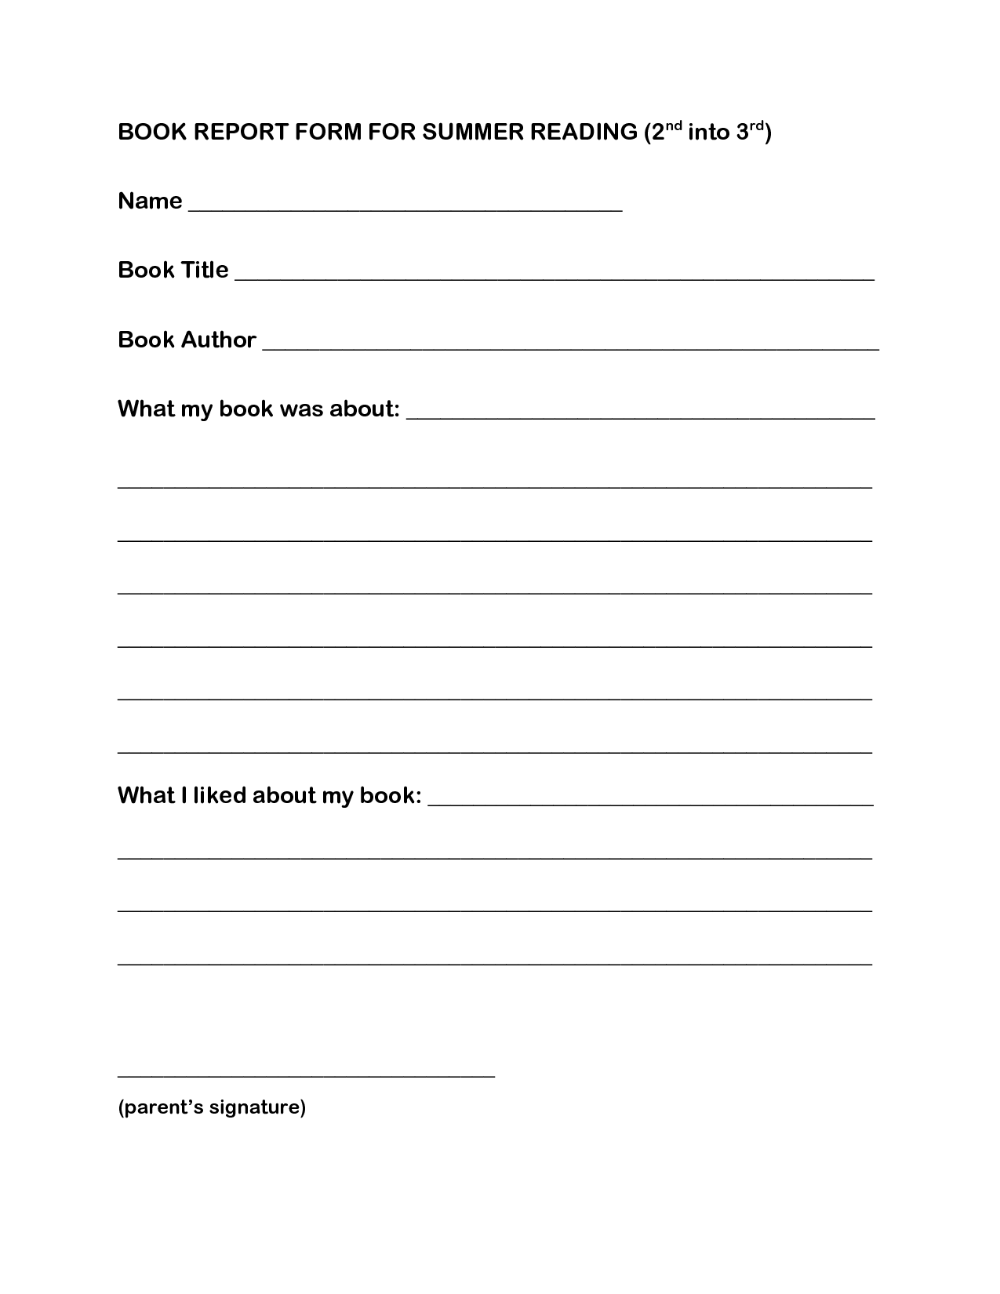 Book Report Template Grade 9 3 Templates Example Templates Example Book Report Templates Book Report Biography Book Report Template [ 1294 x 1000 Pixel ]